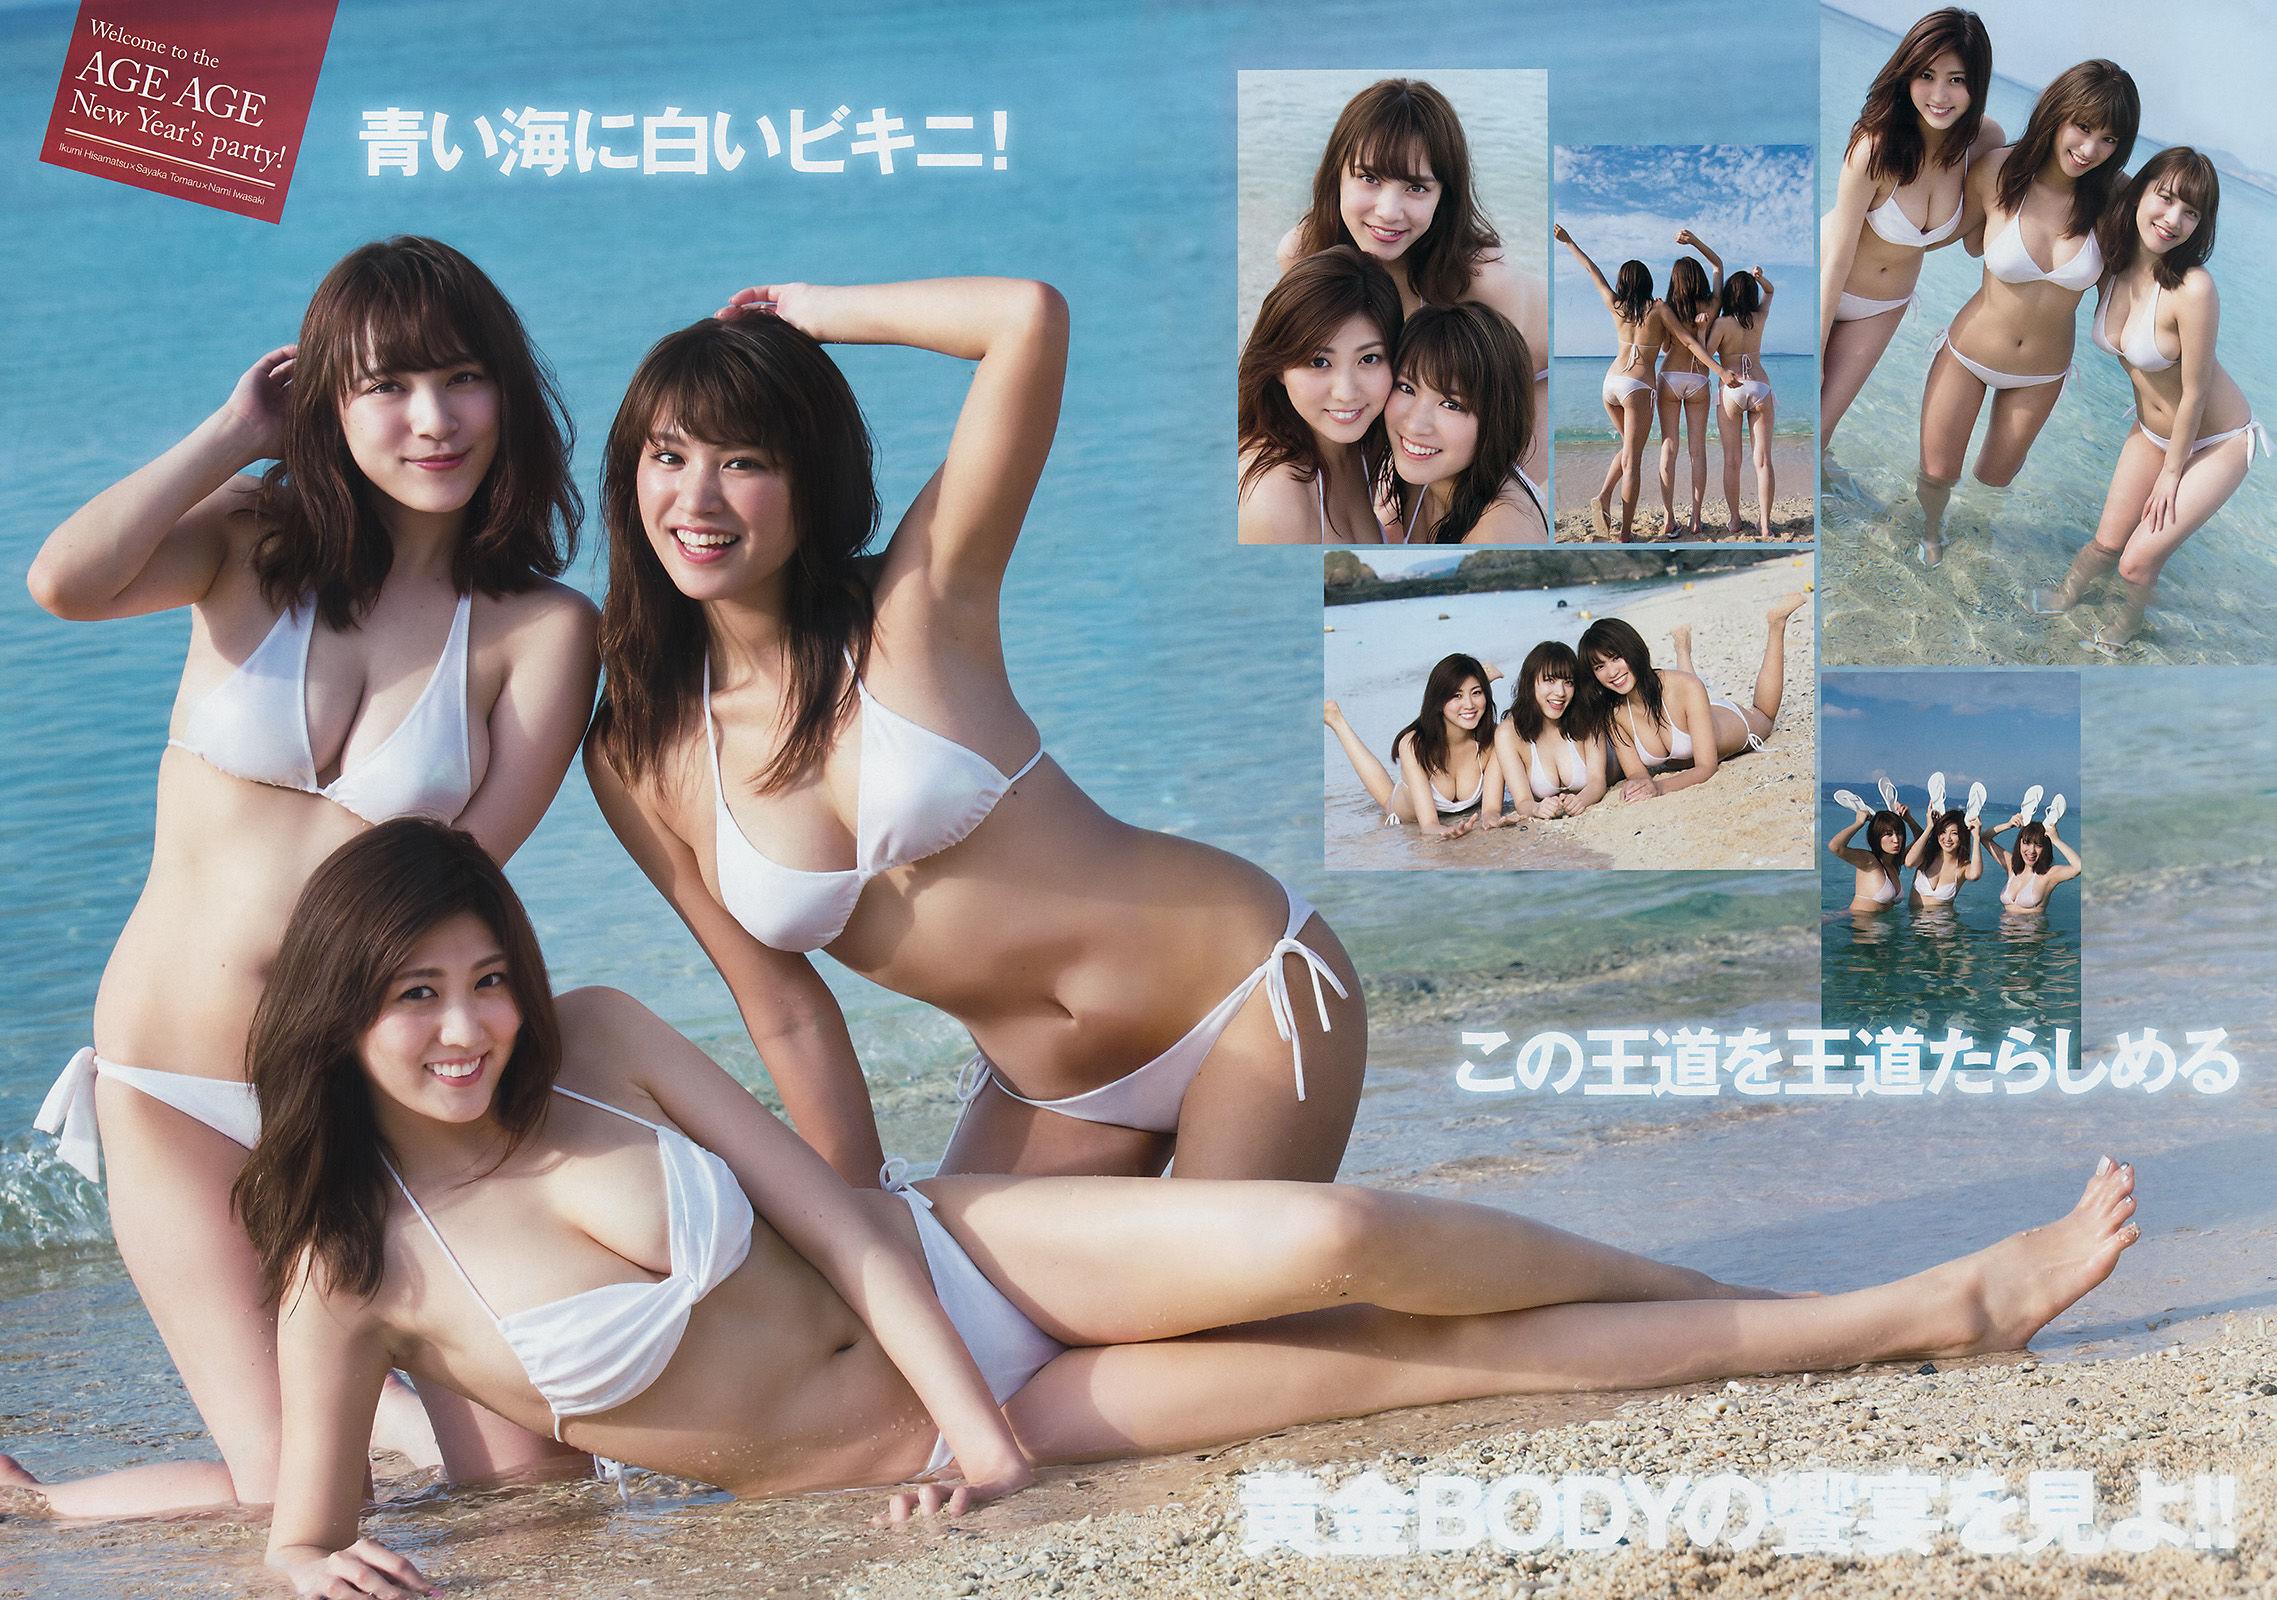 VOL.97 [Young Magazine]姐妹花:久松郁实超高清写真套图(11P)